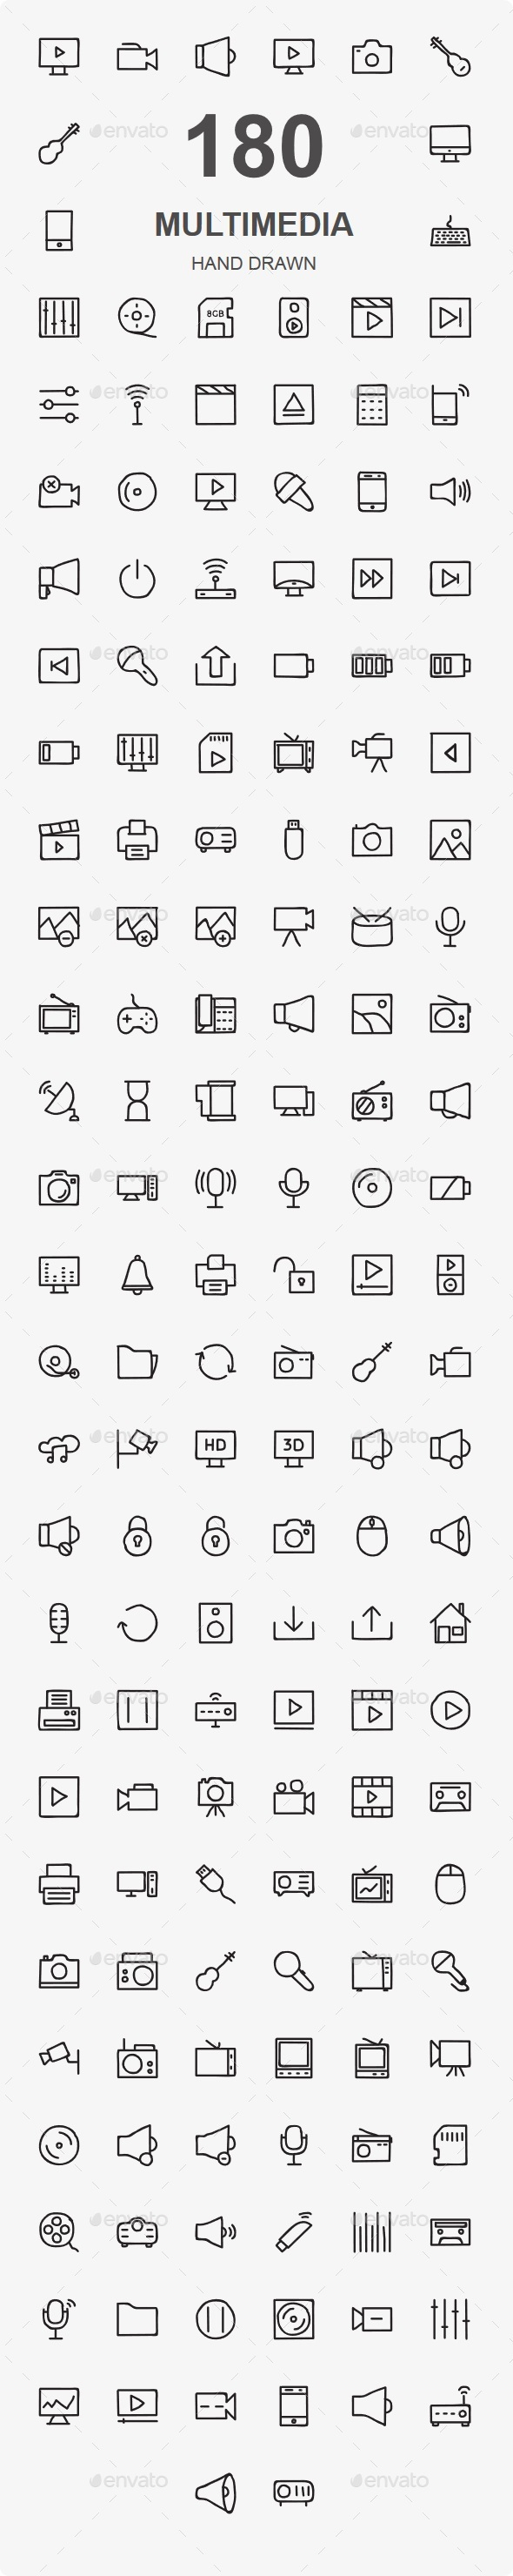 150+ Multimedia Hand Drawn - Media Icons